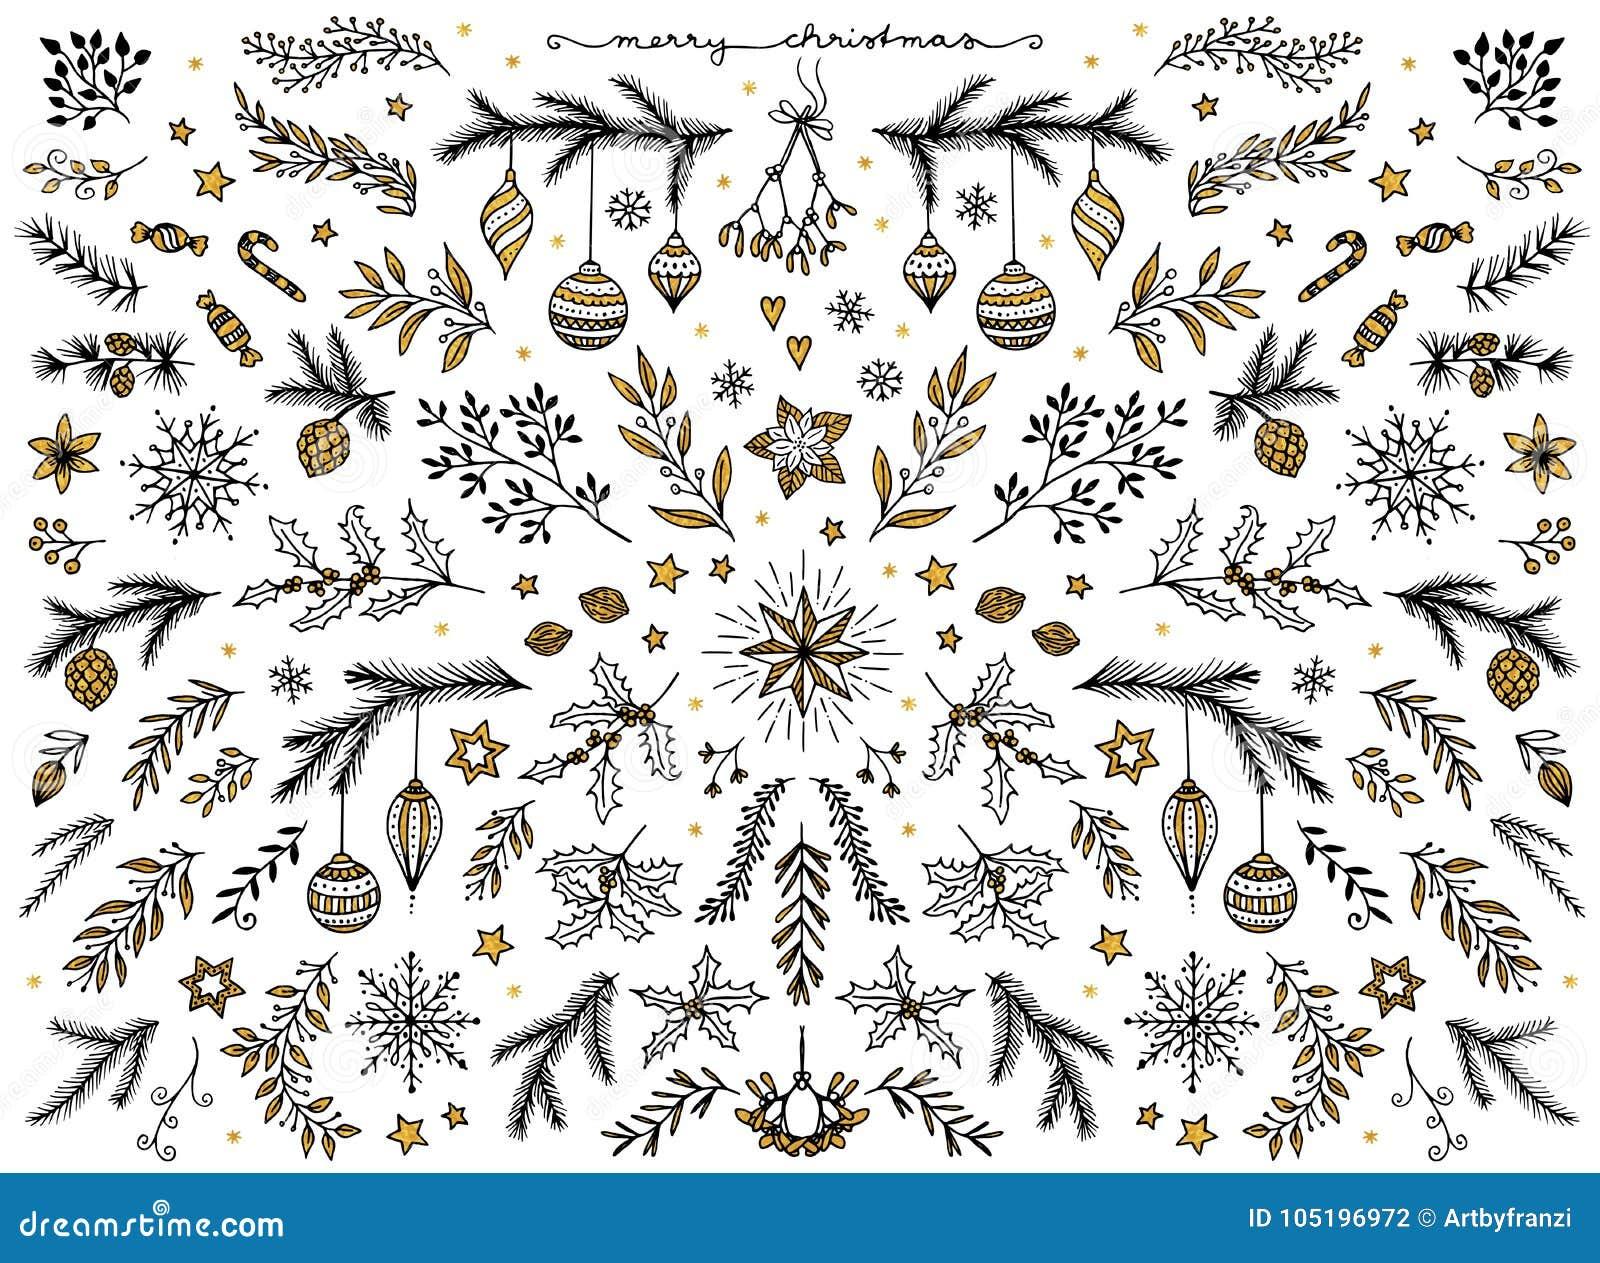 Floral στοιχεία σχεδίου για τα Χριστούγεννα, με το χρυσό φύλλο αλουμινίου